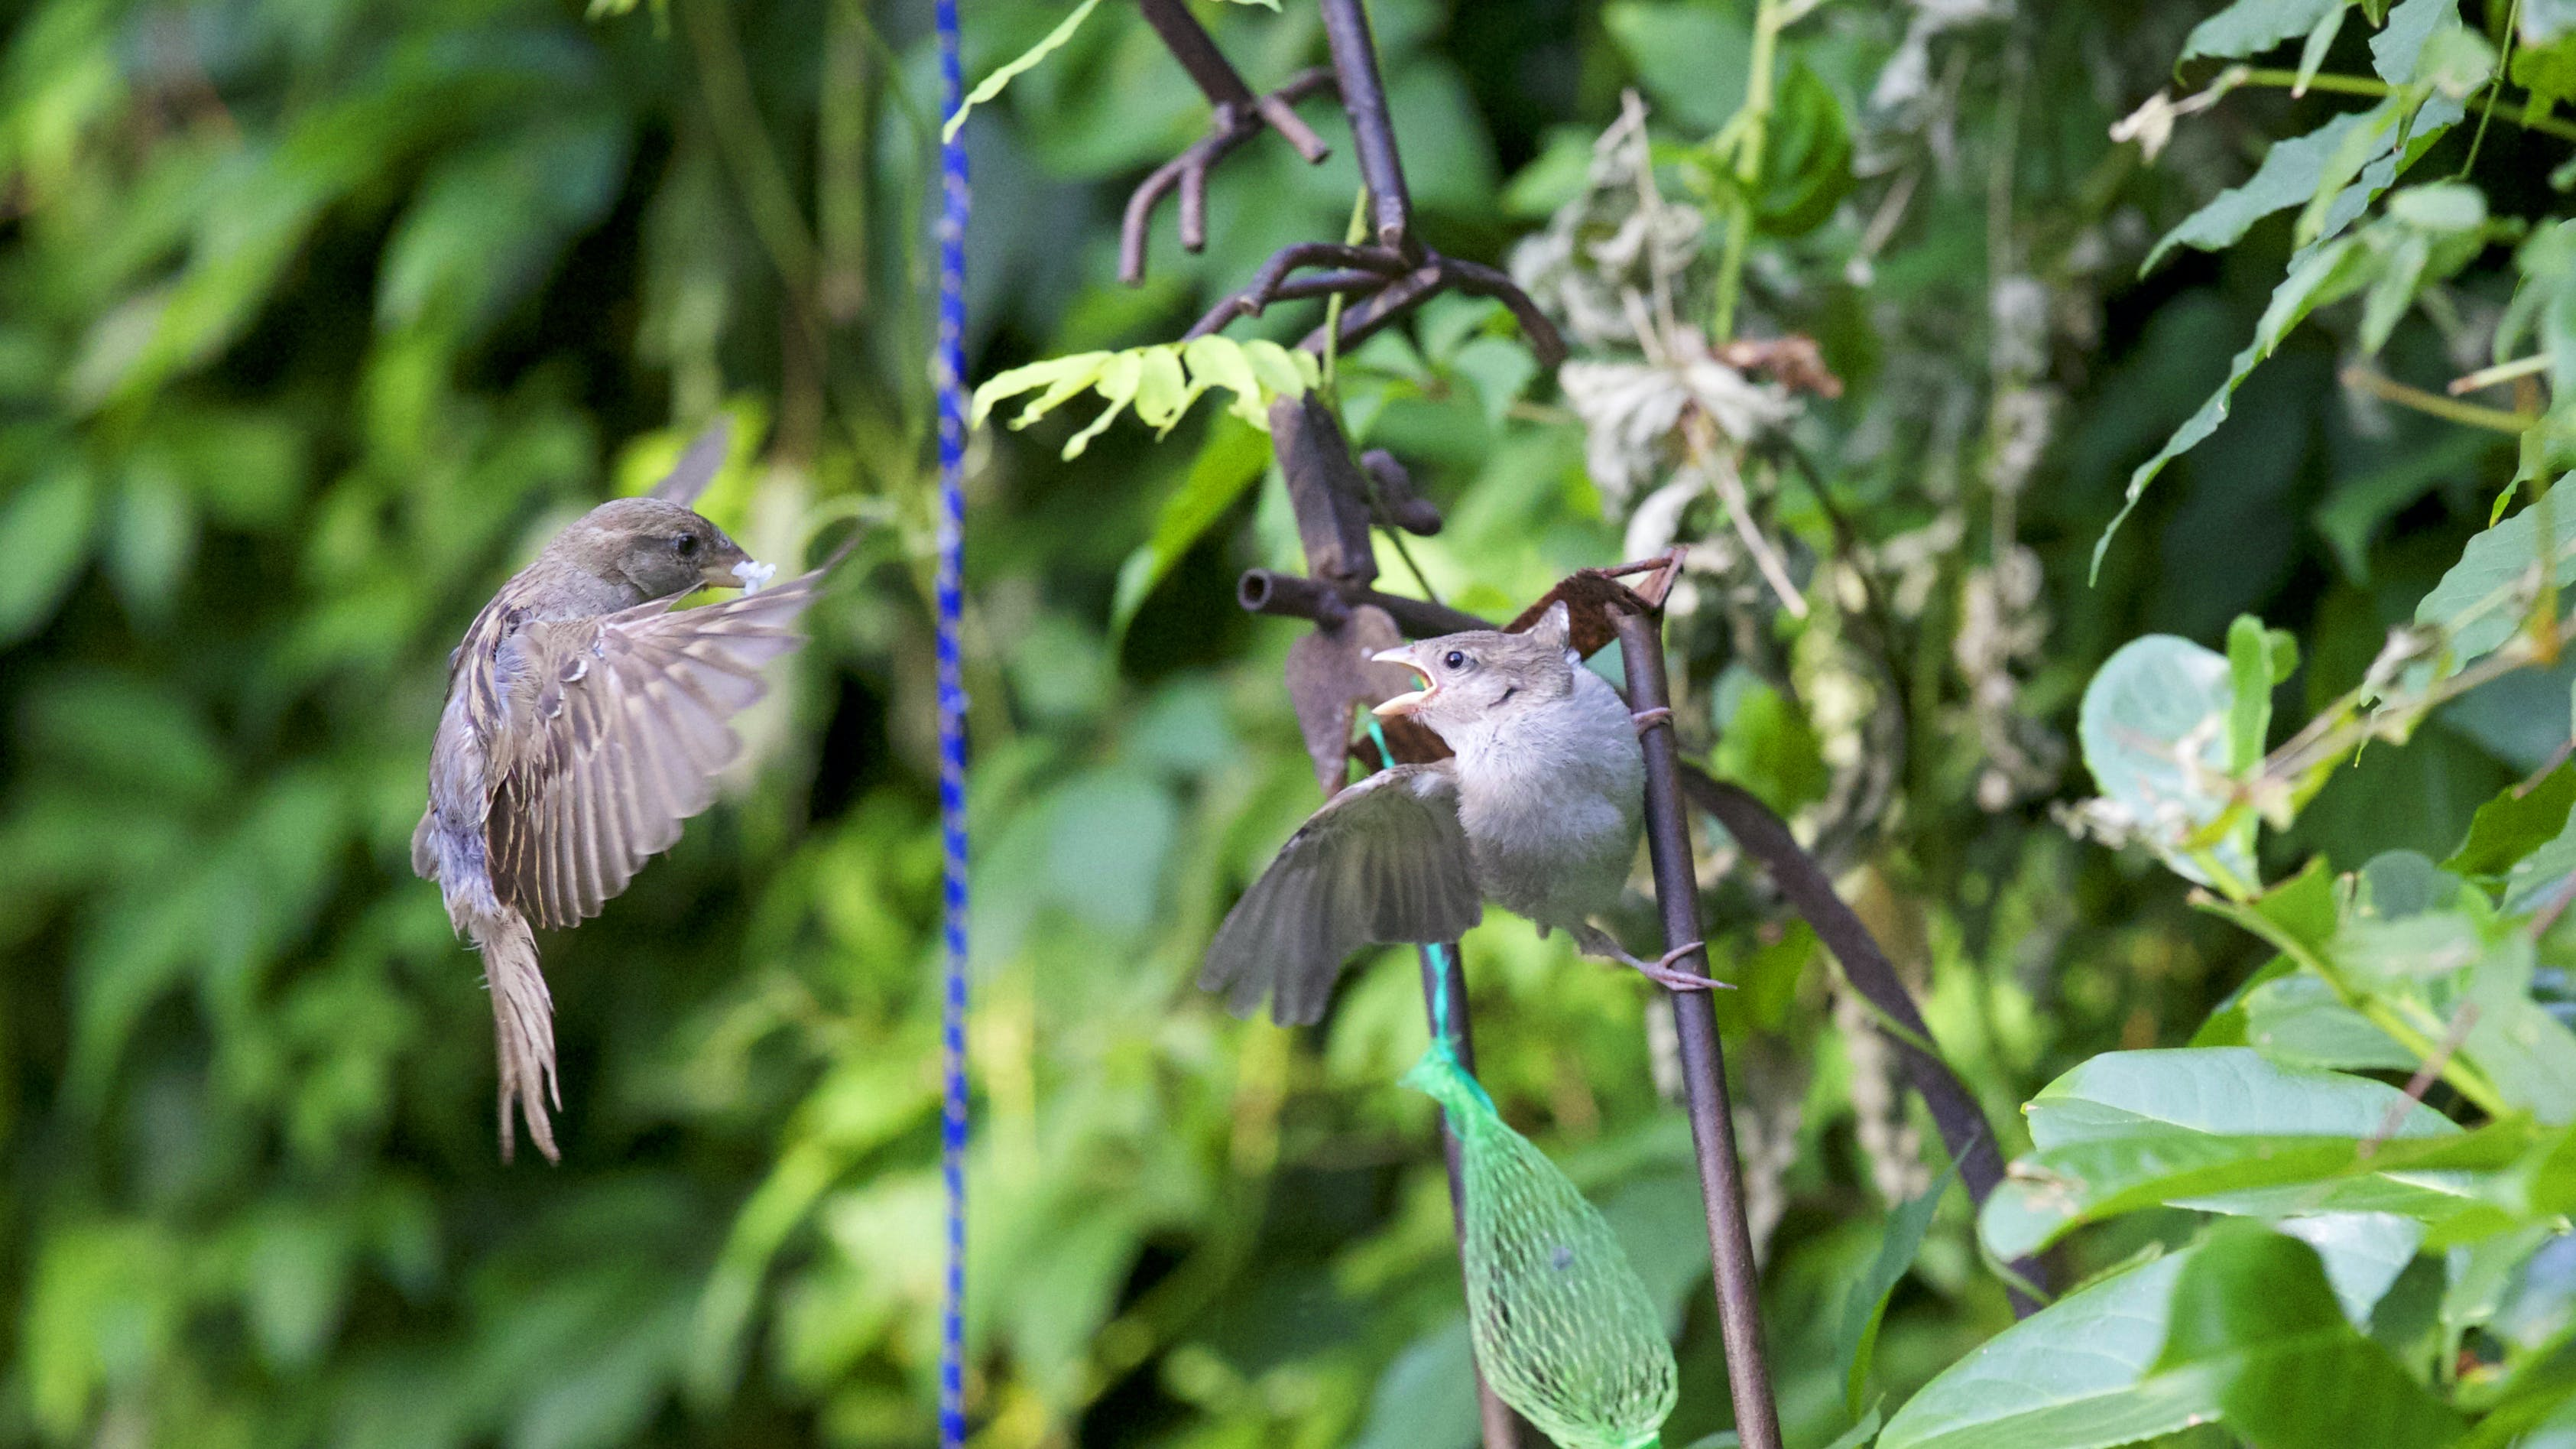 Gray Bird Flying during Daytime